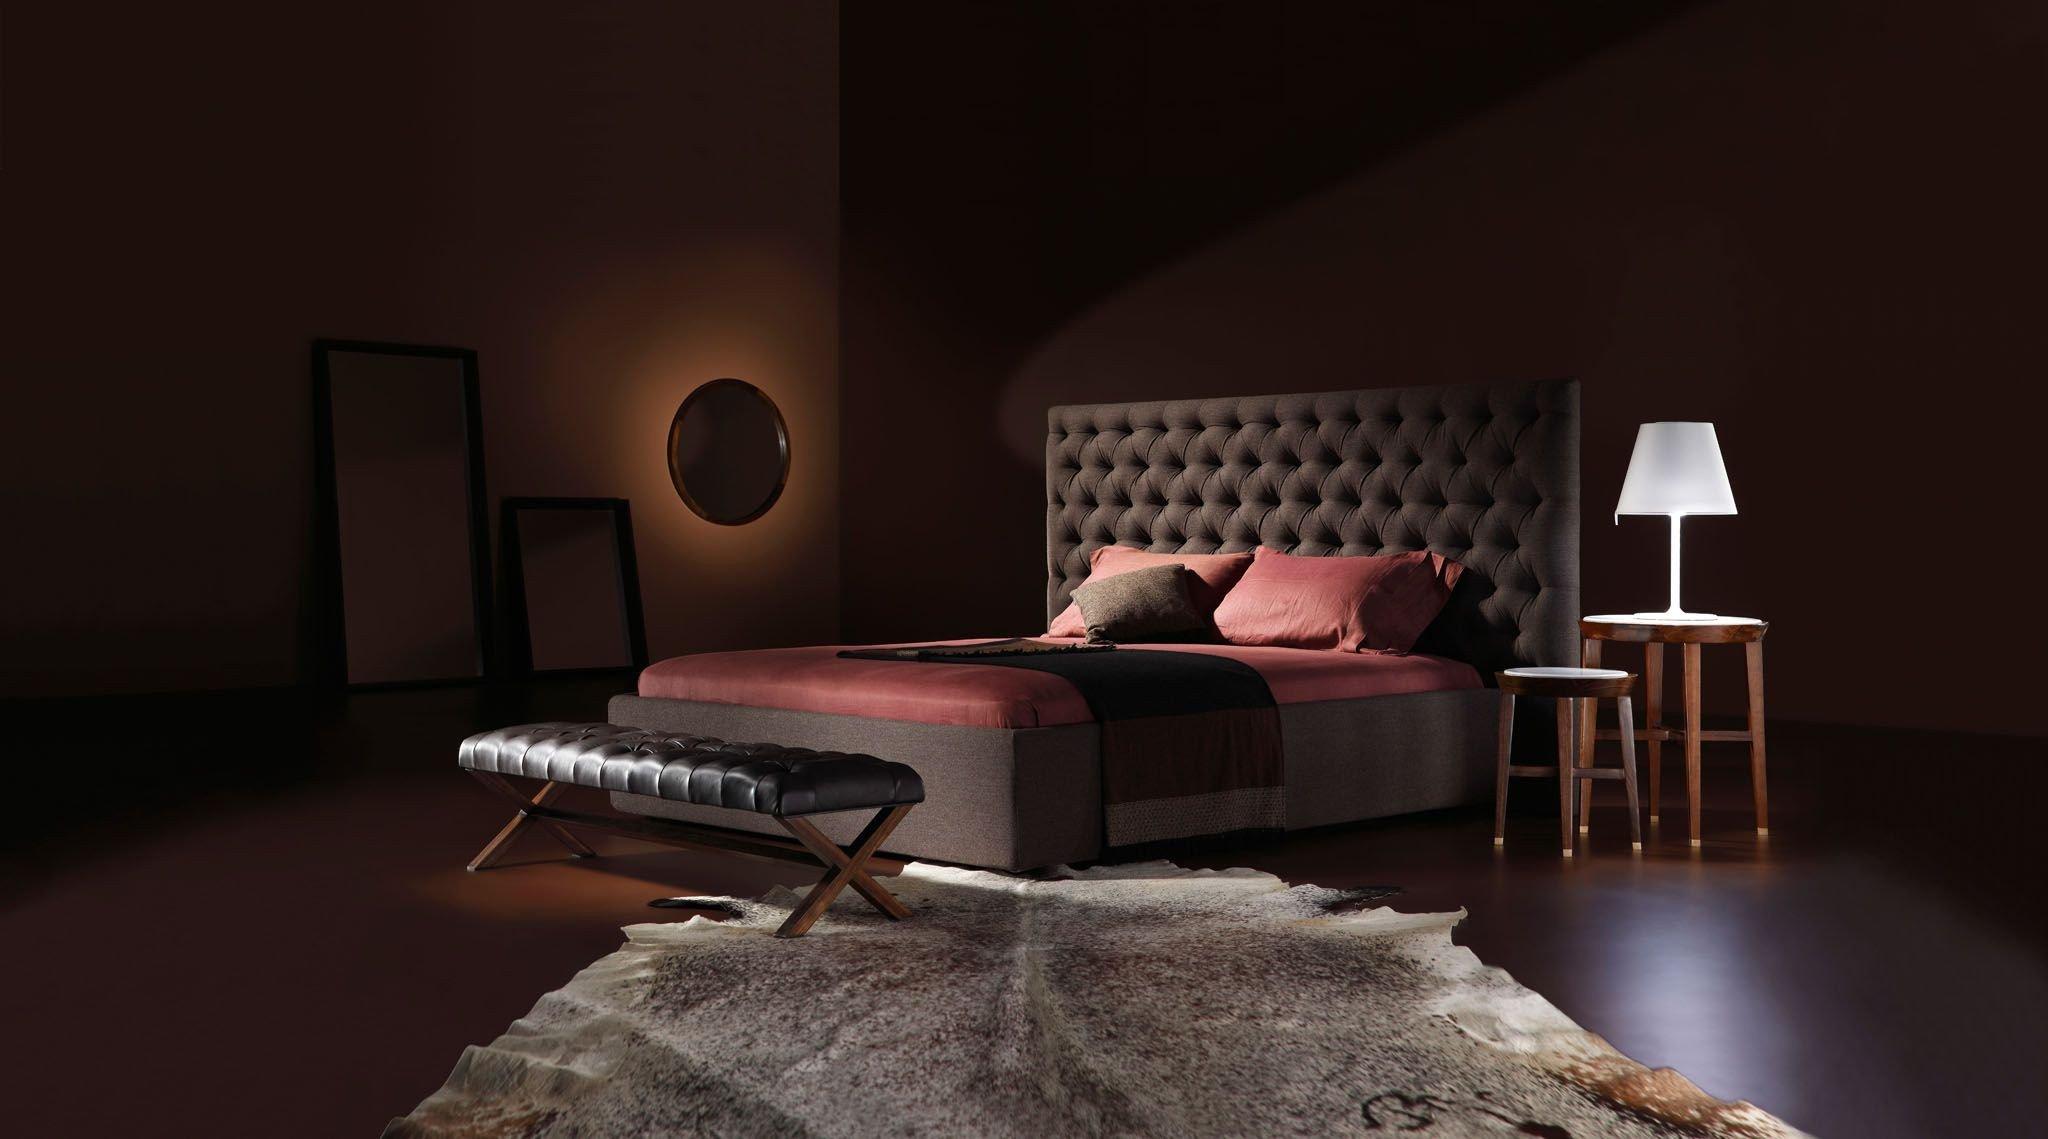 Classic Italian Bedroom Furniture Best Of Simply Casa orro Our Italian Brand Warm Classic Bedroom